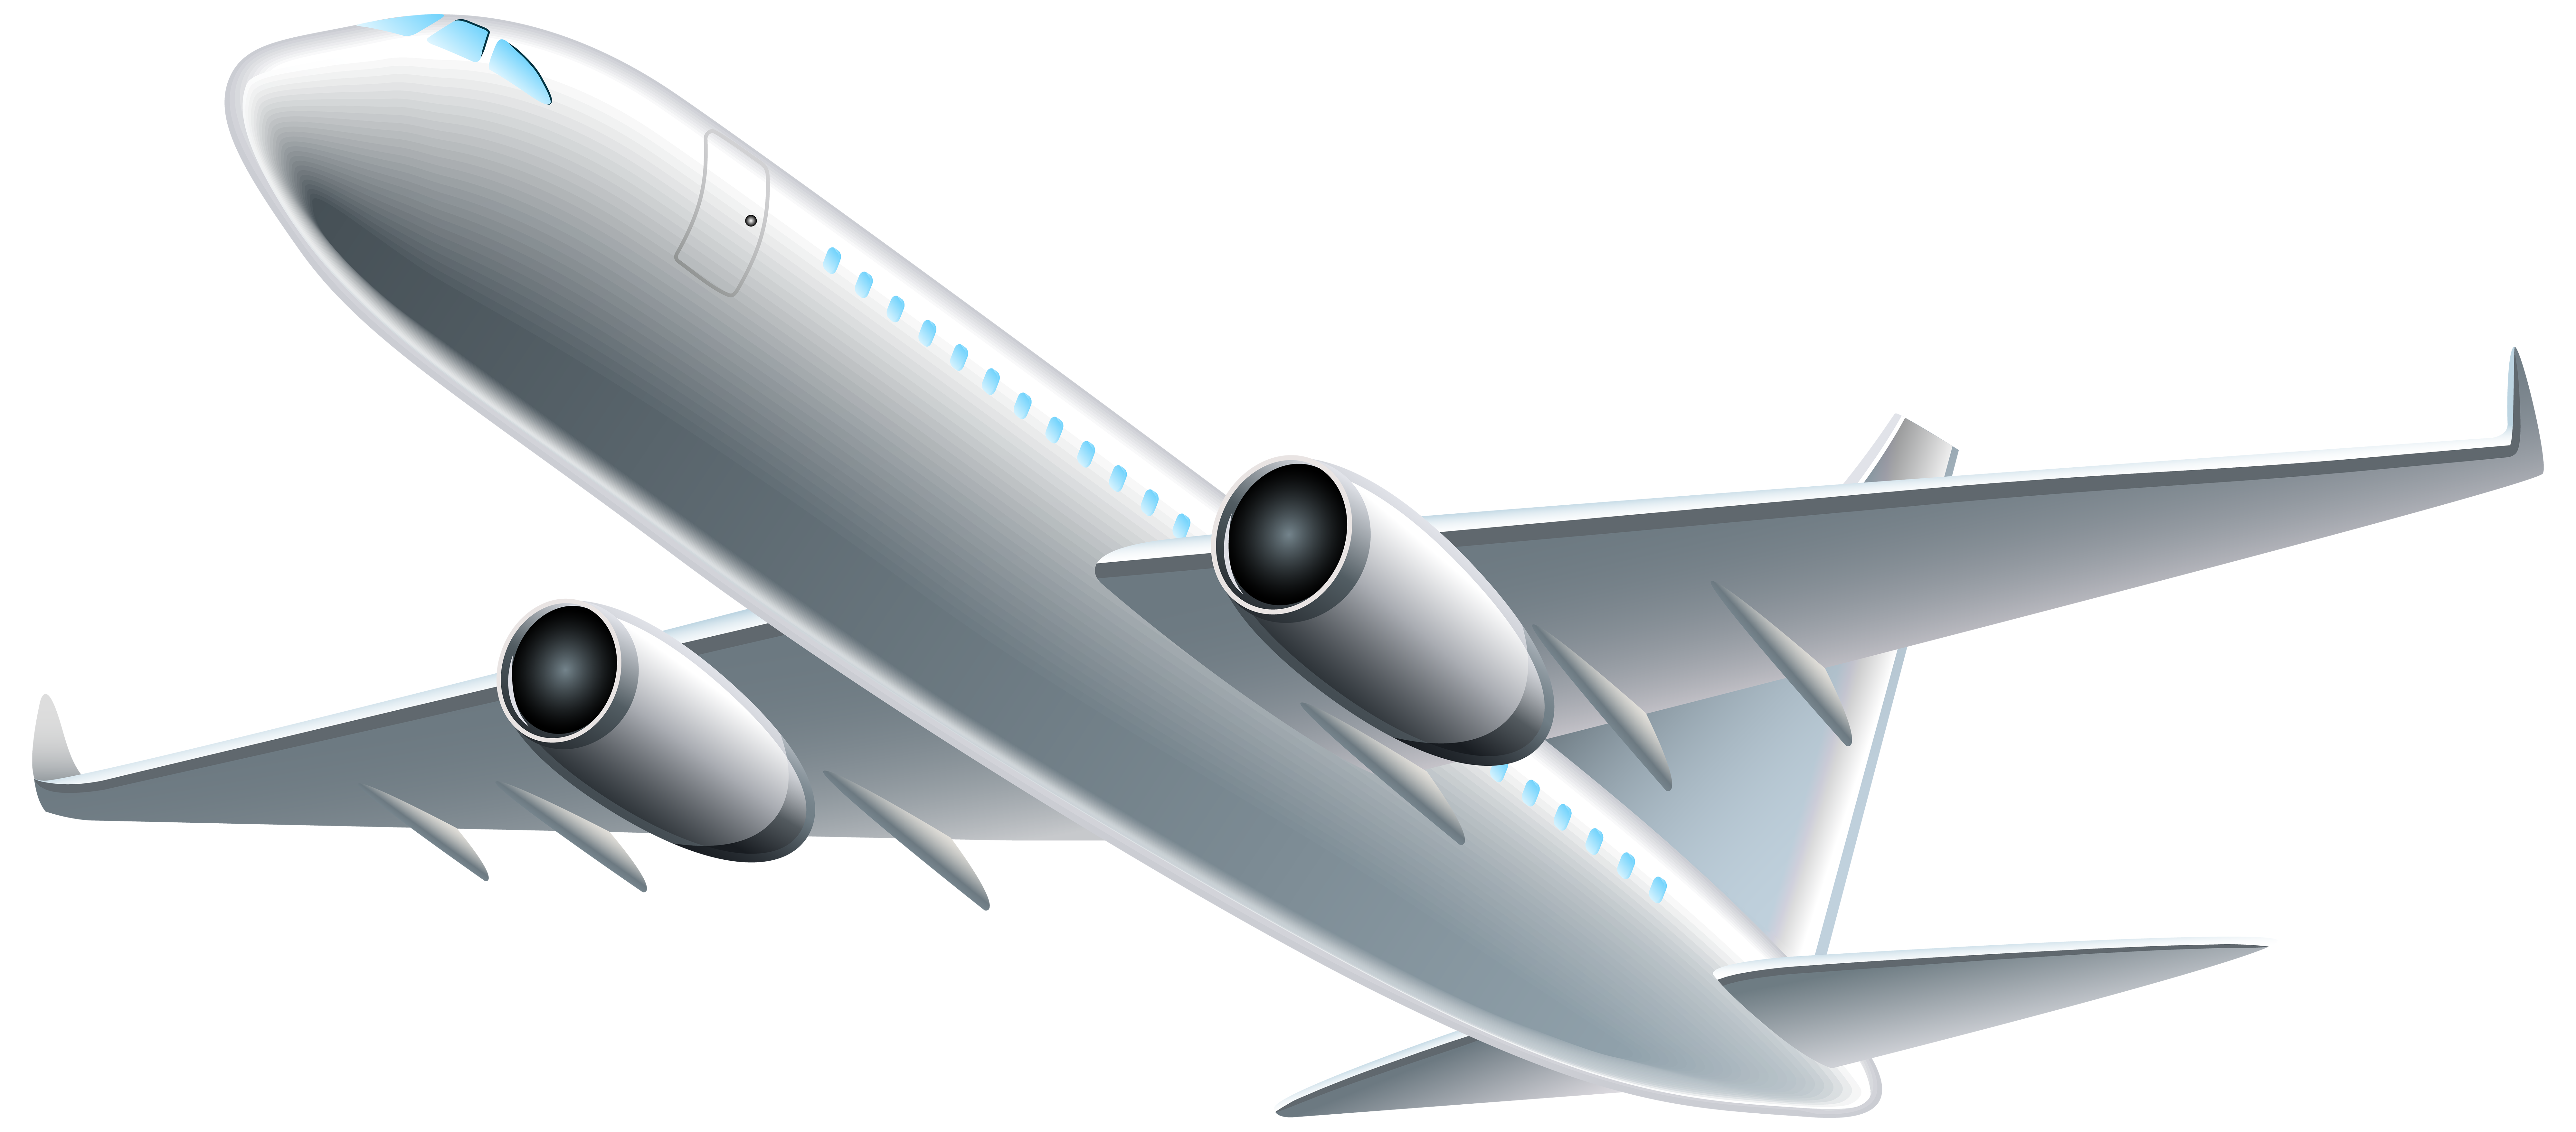 Png clip art gallery. Clipart plane transparent background